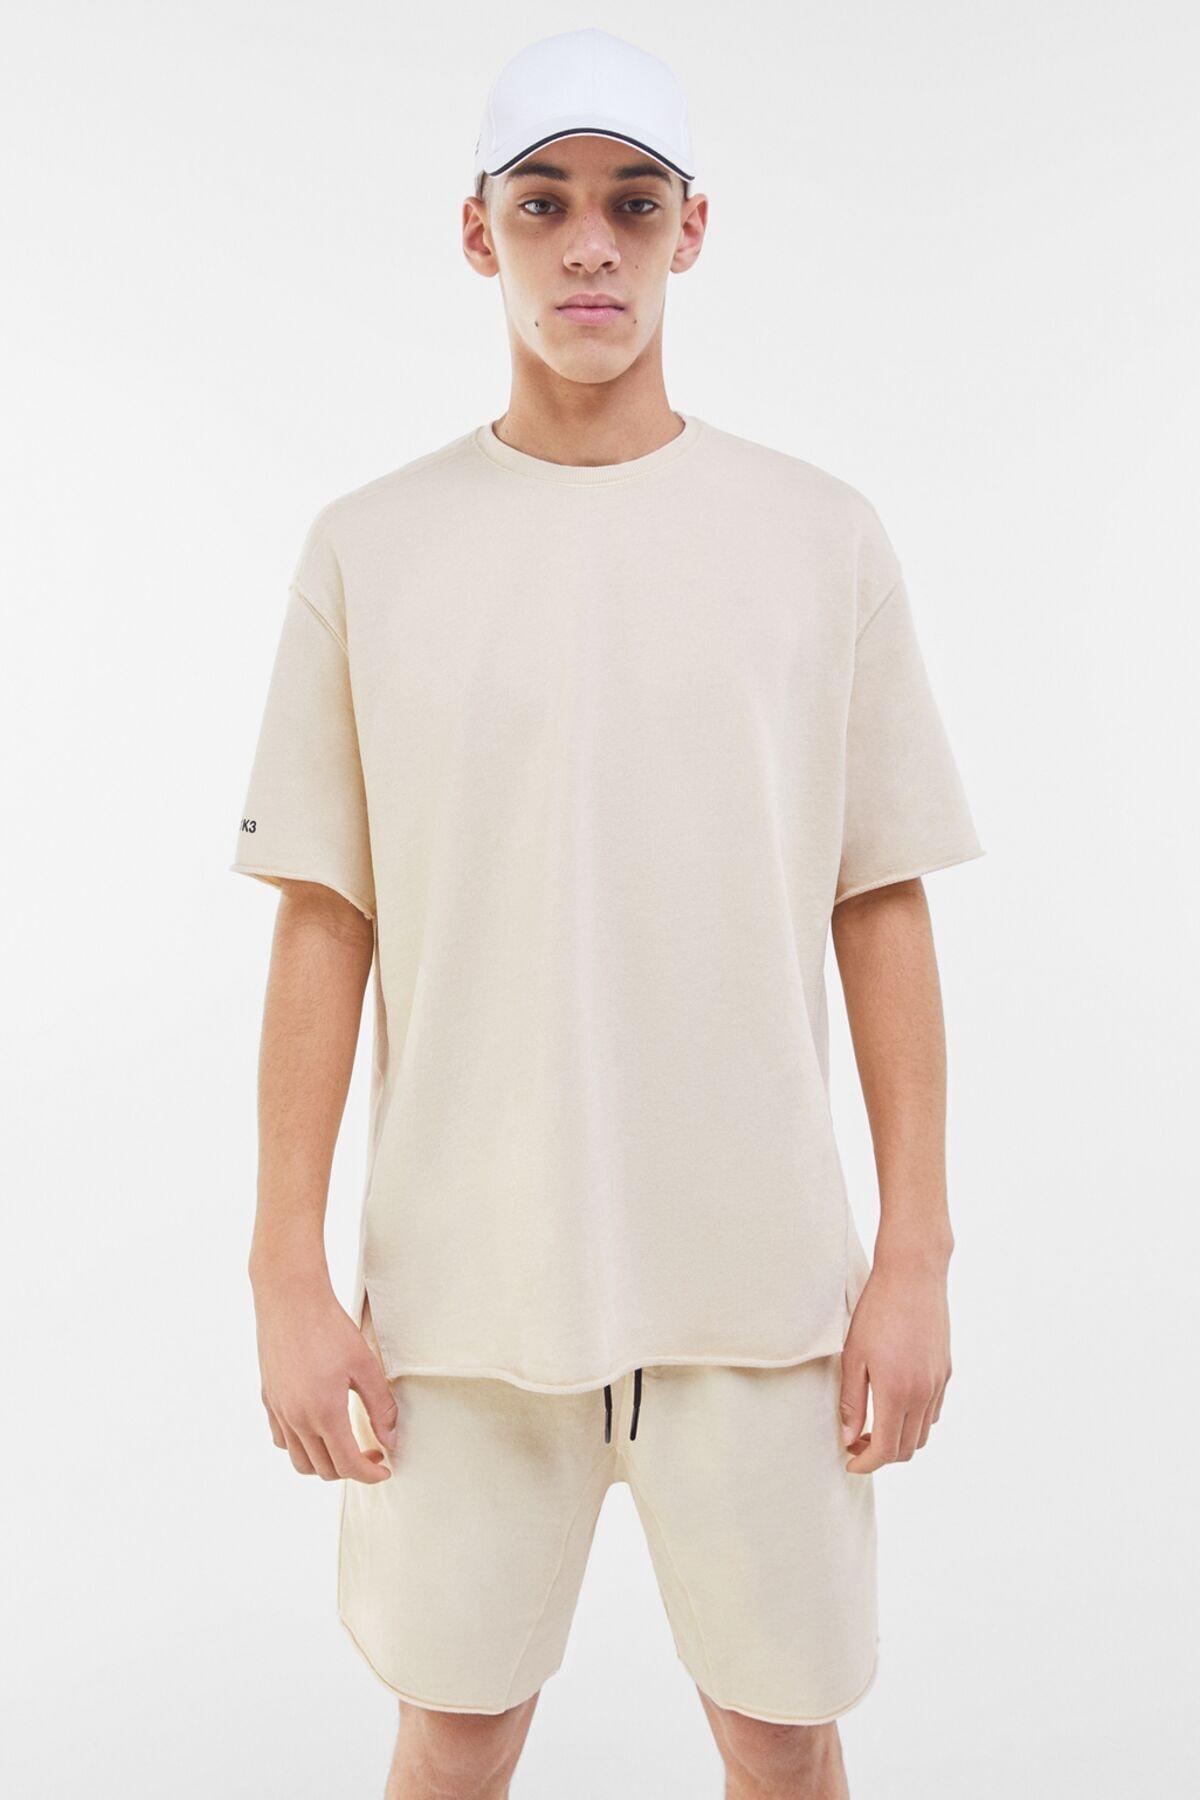 Bershka Erkek Kum Rengi Soluk Efektli Pamuklu T-Shirt 02406240 0